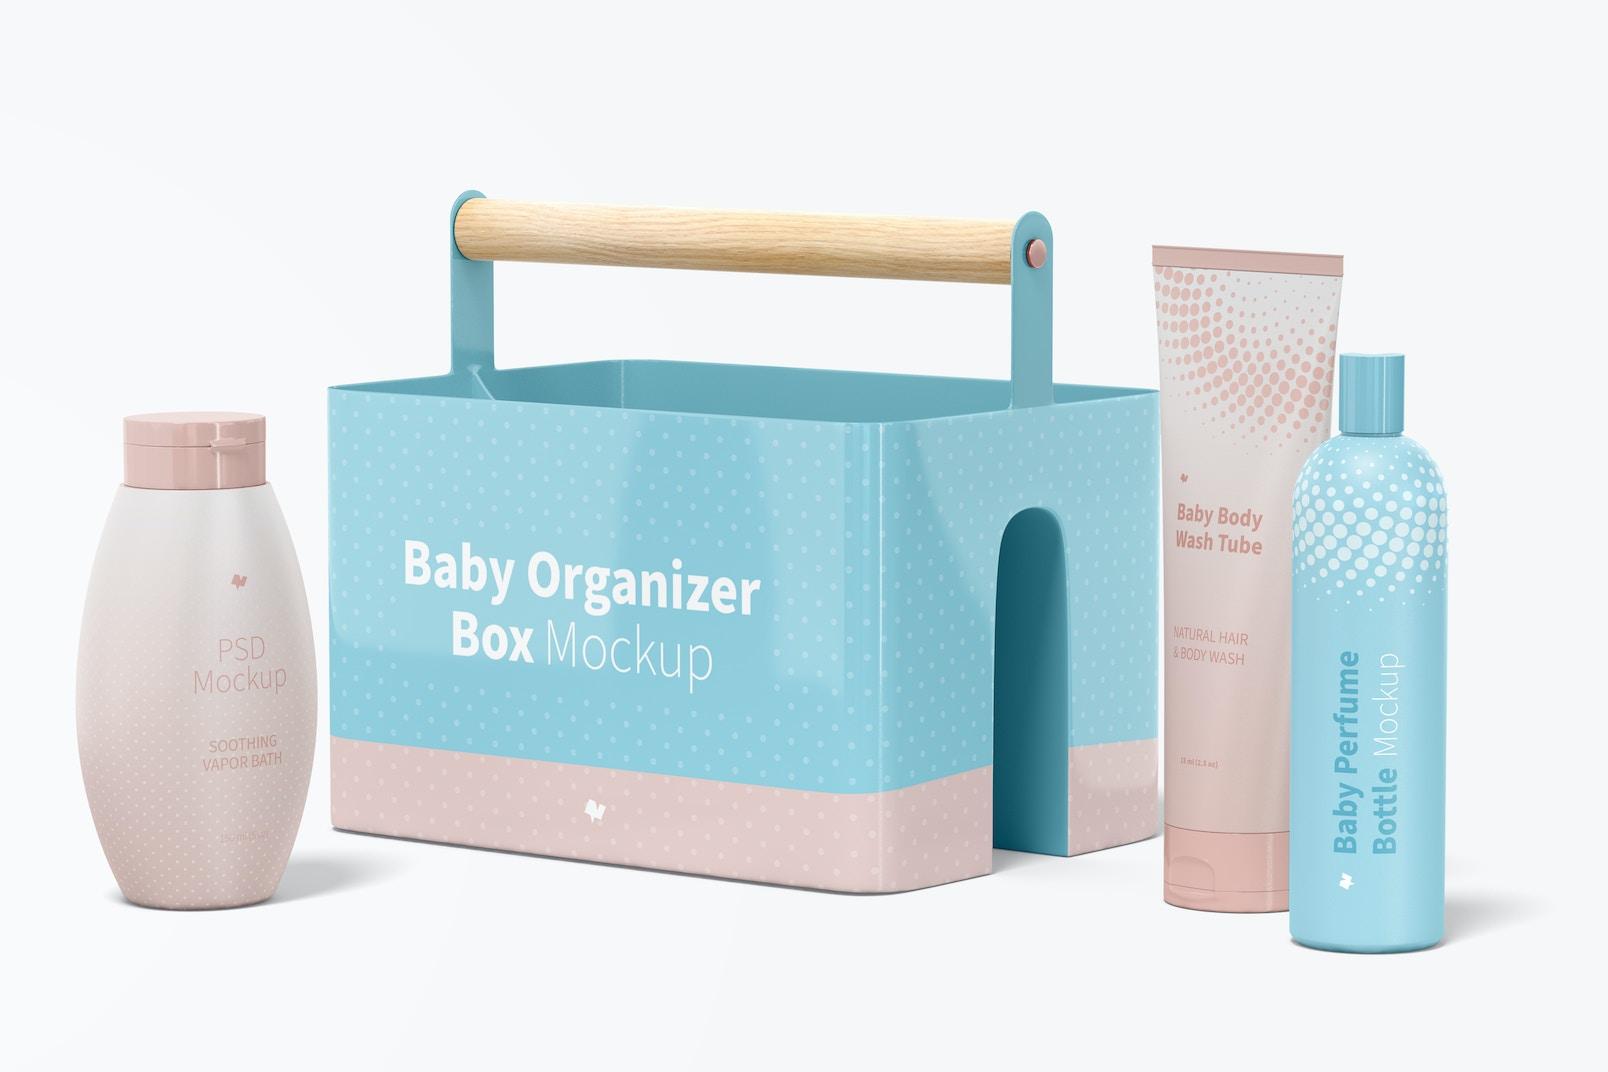 Baby Organizer Box Mockup, Right View